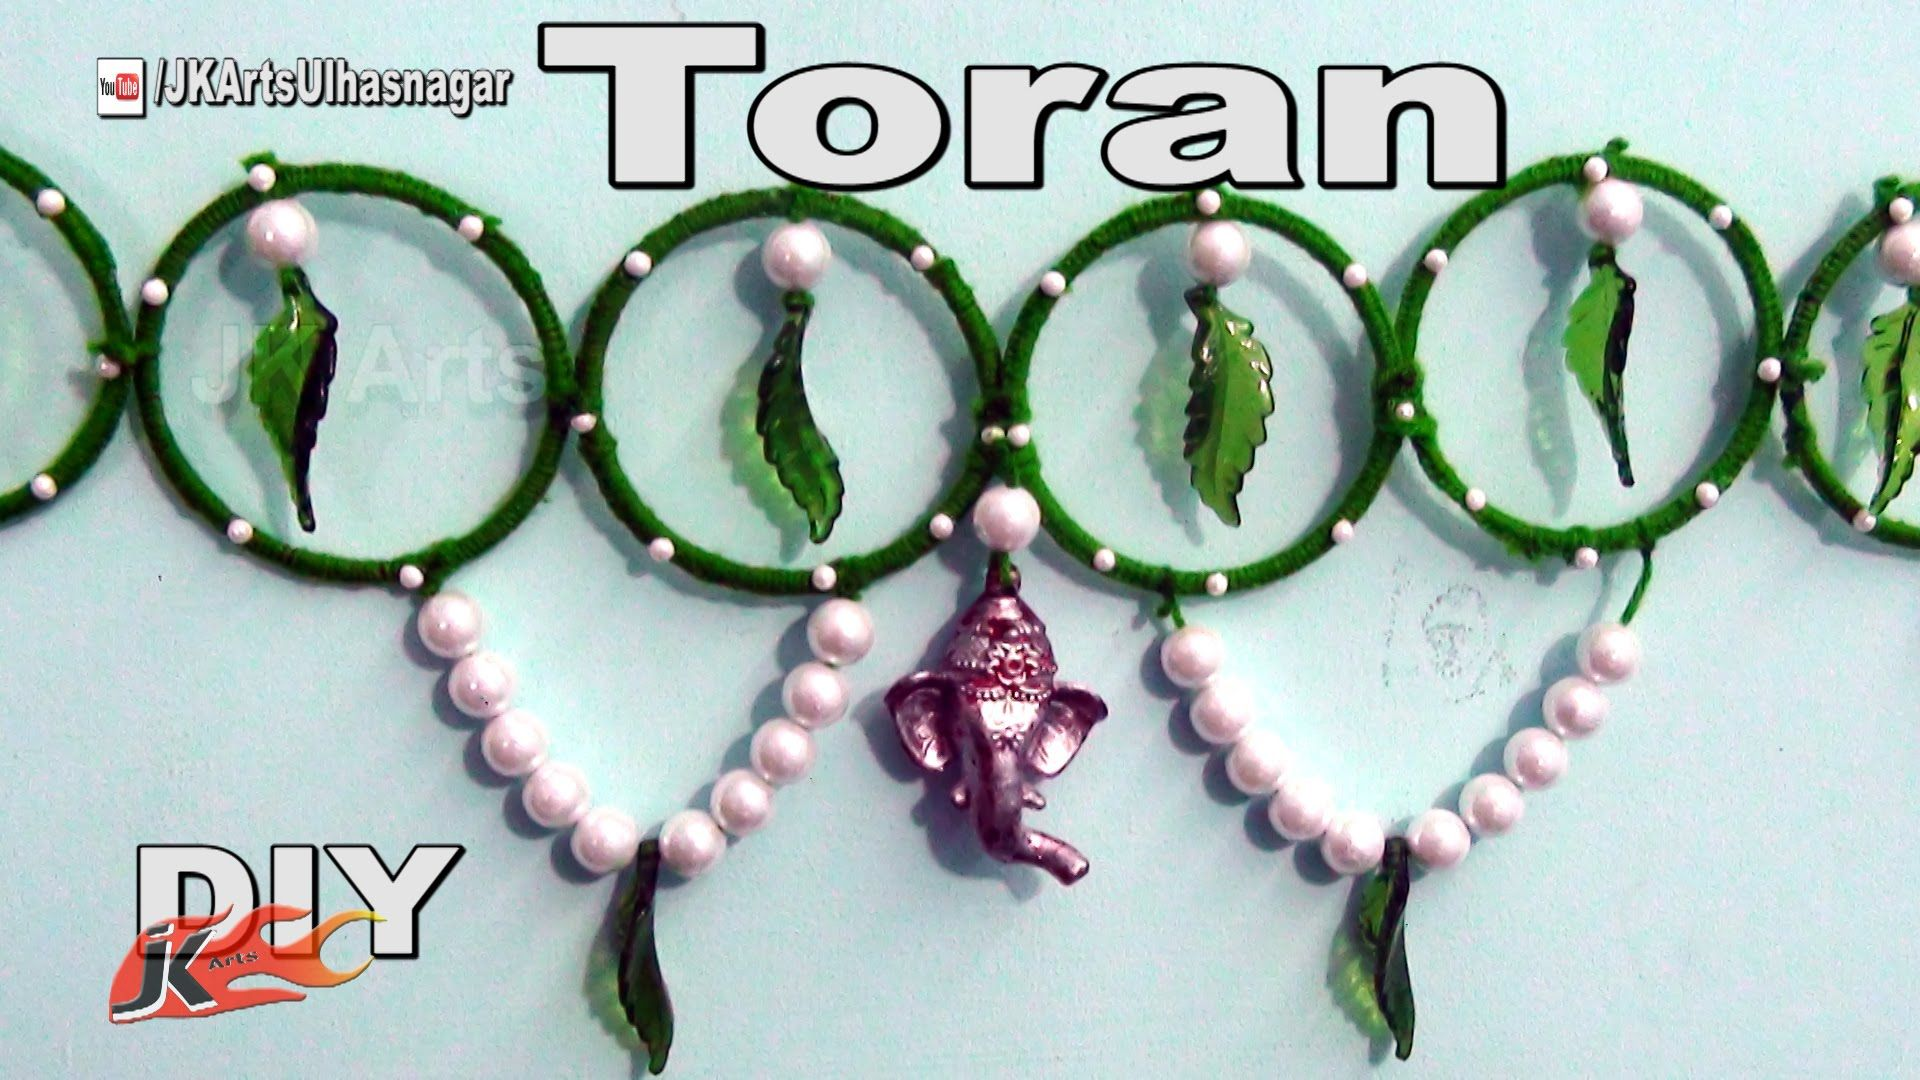 Diy toran bandhanwar from waste bangles how to make for Craft using waste bangles